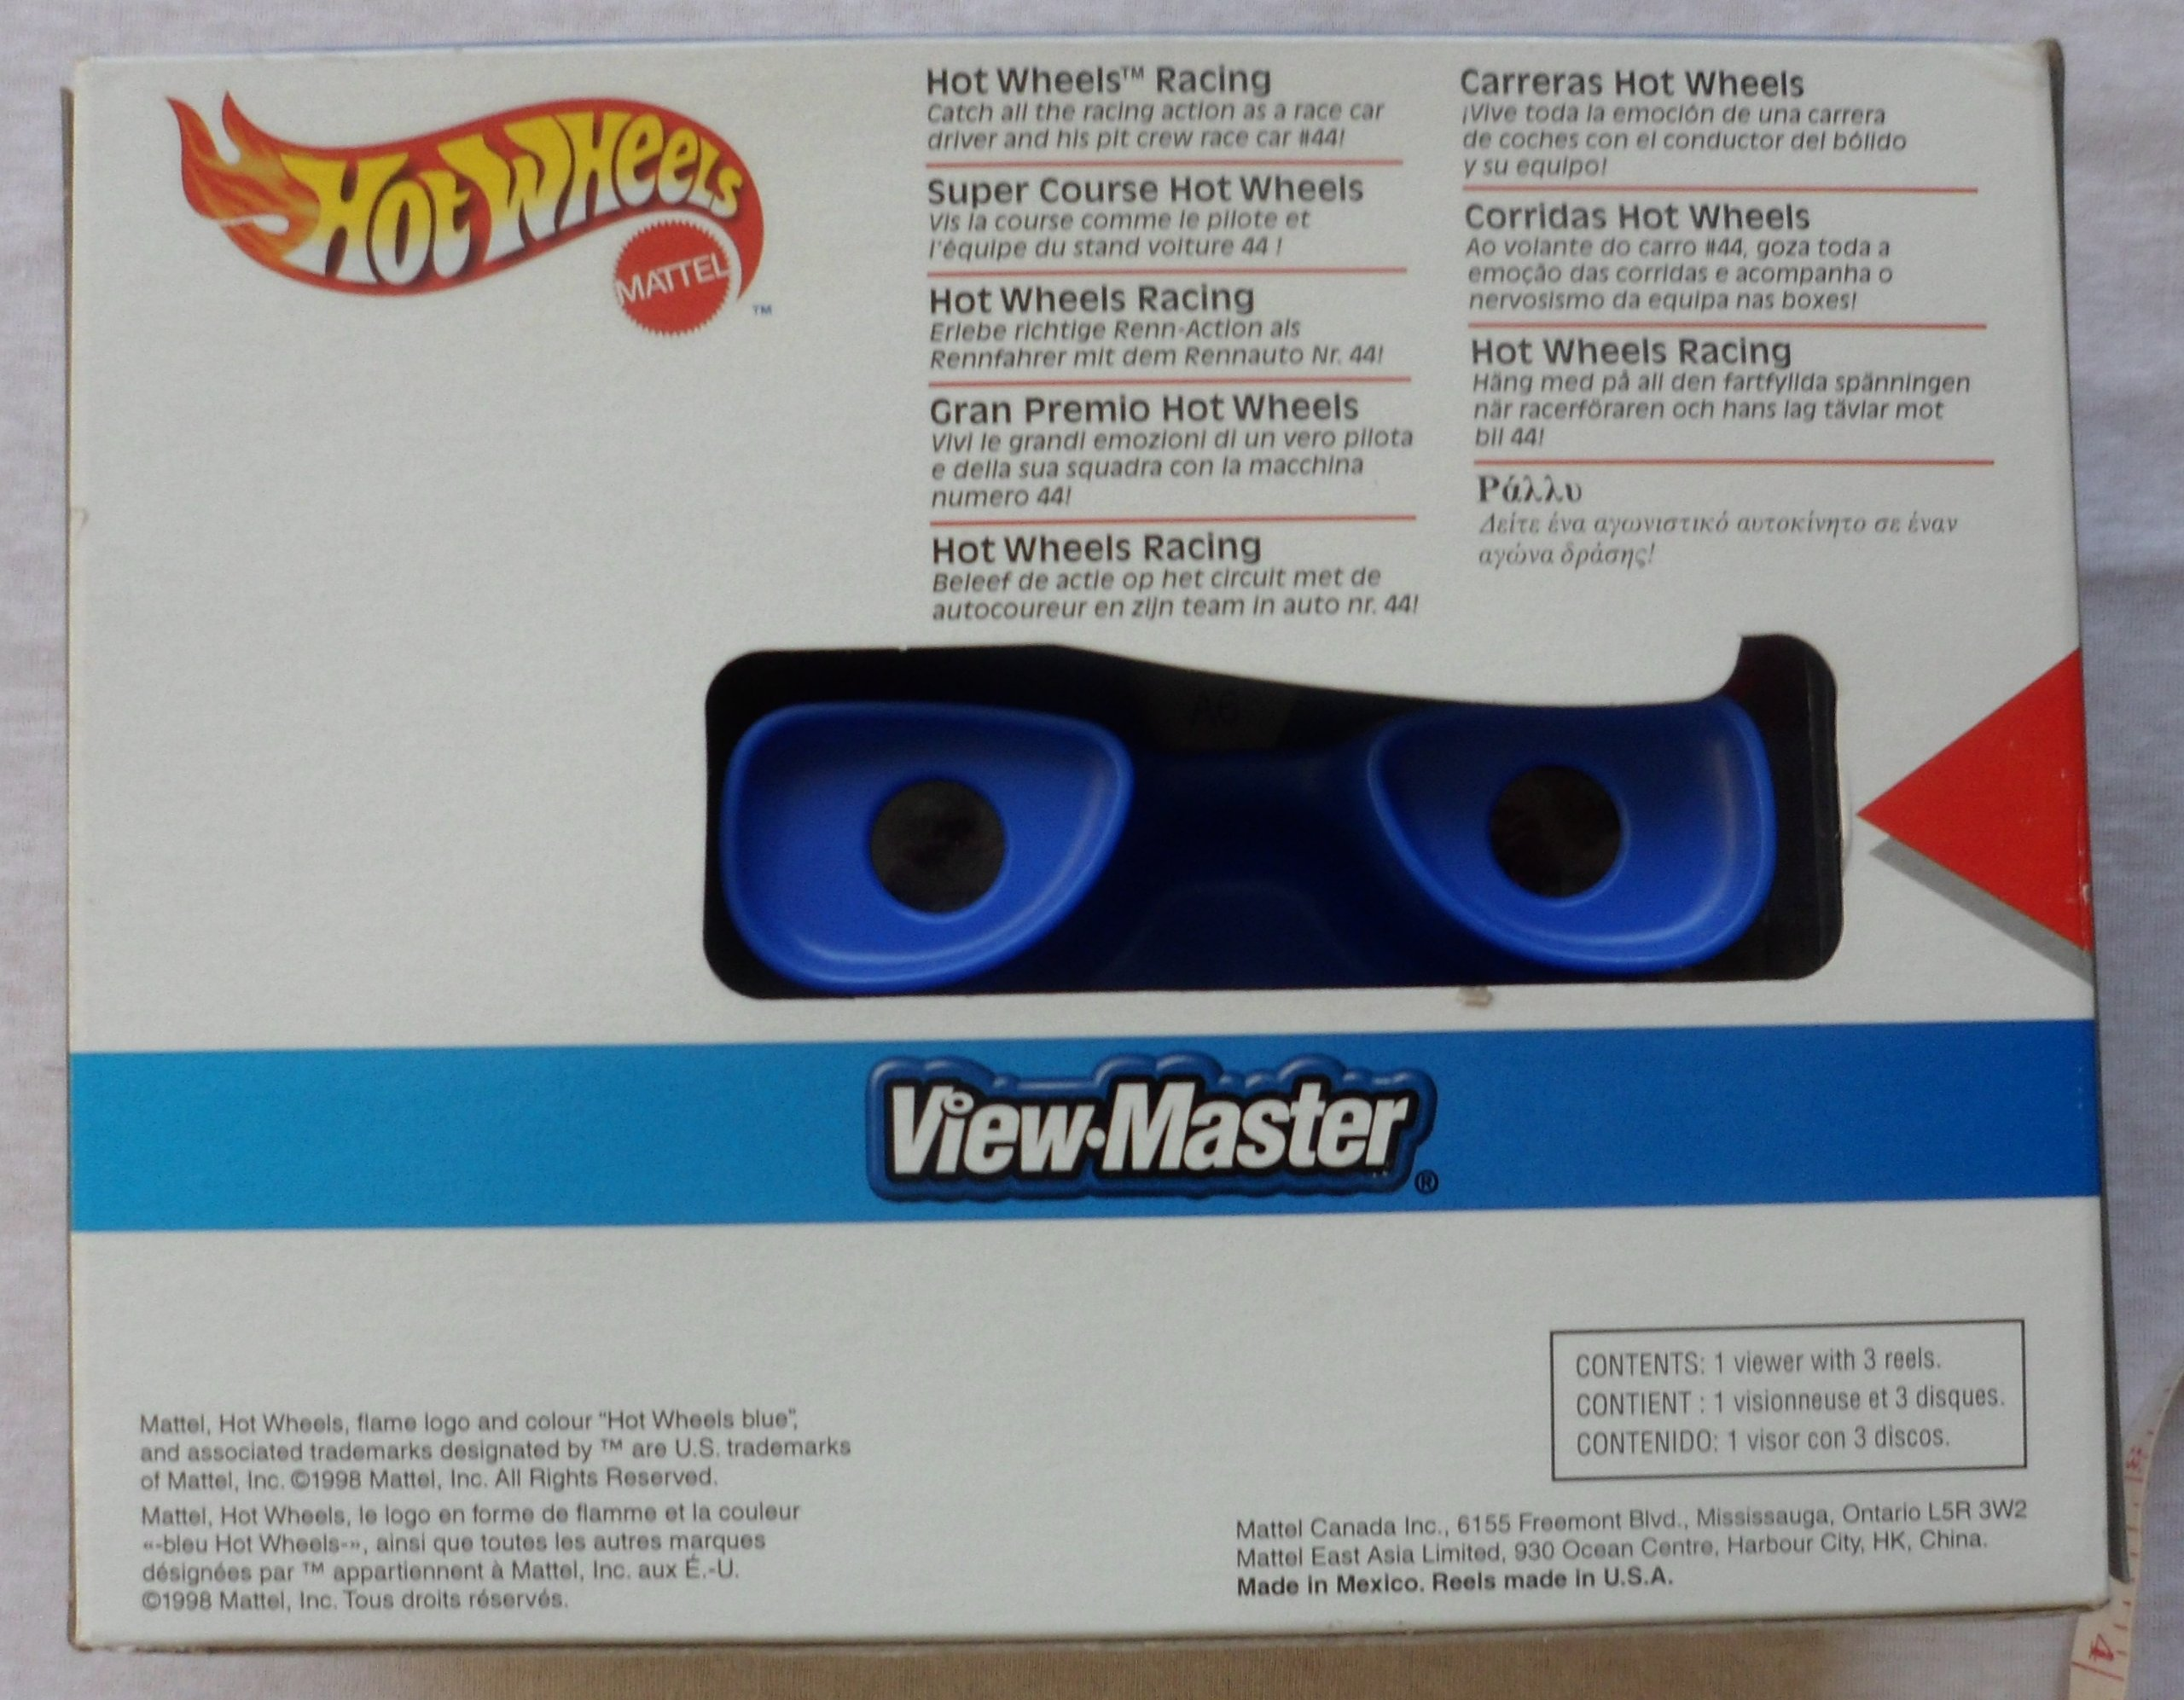 HOT WHEELS Racing Kyle Petty View Master Mattel by Hot Wheels (Image #4)